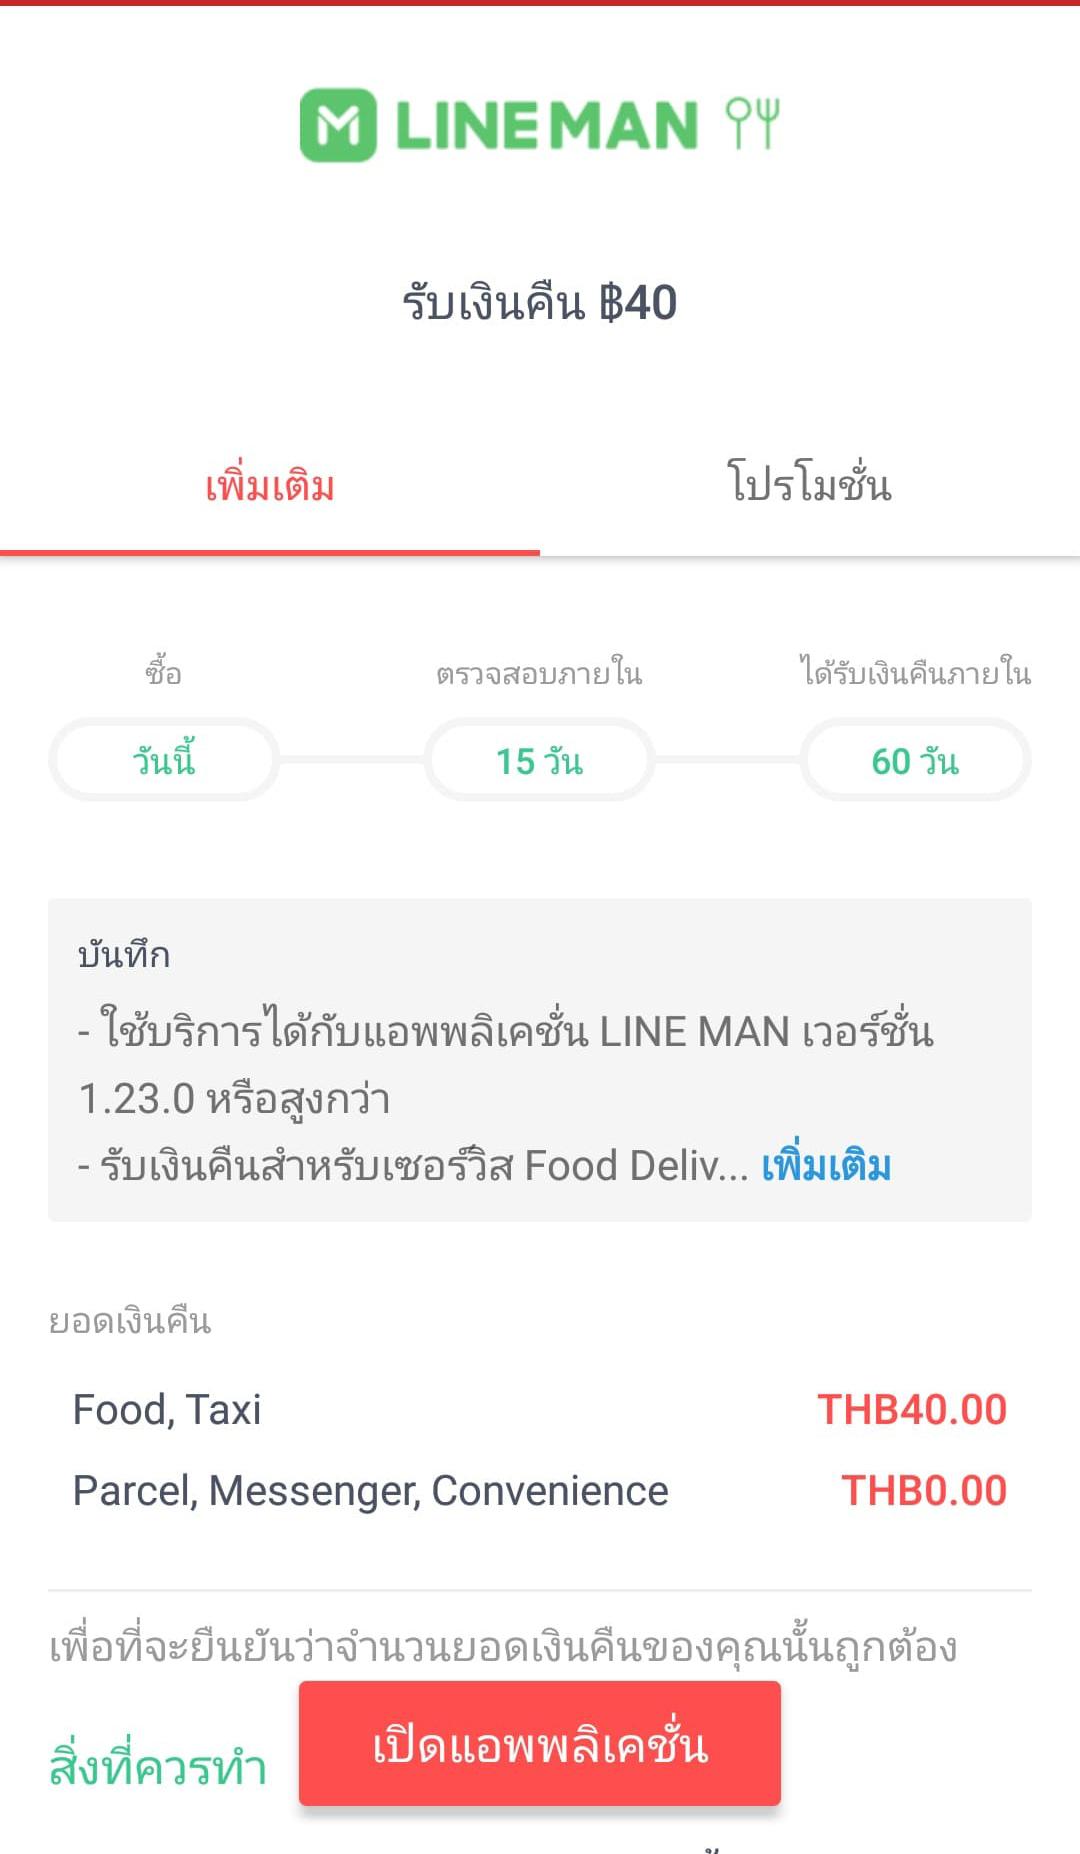 LINE MAN ไลน์แมน LINE MAN คือ LINE MAN สั่งอาหาร